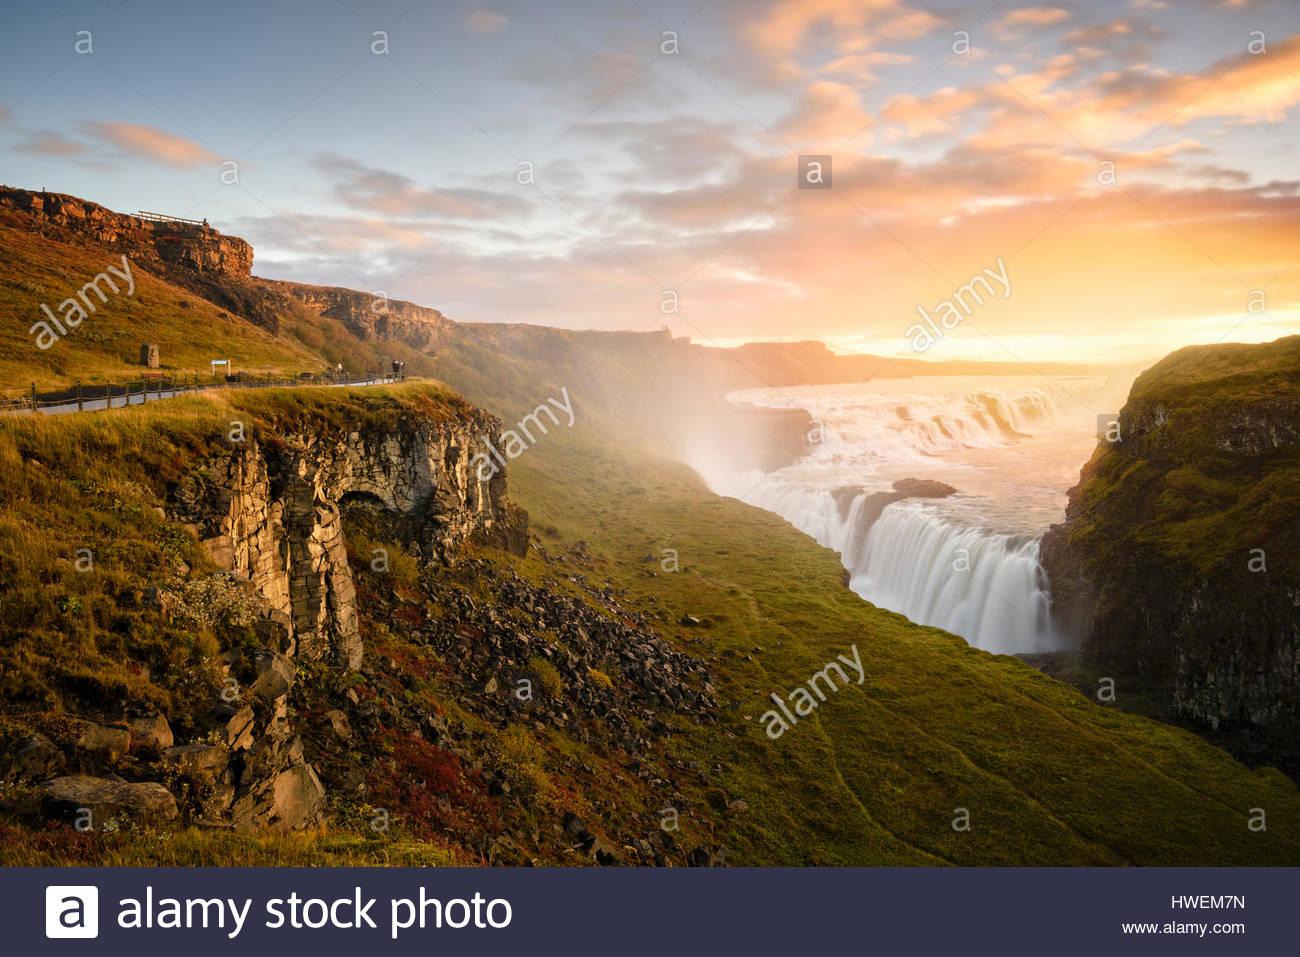 Scenic view, Gullfoss, Iceland - Stock Image